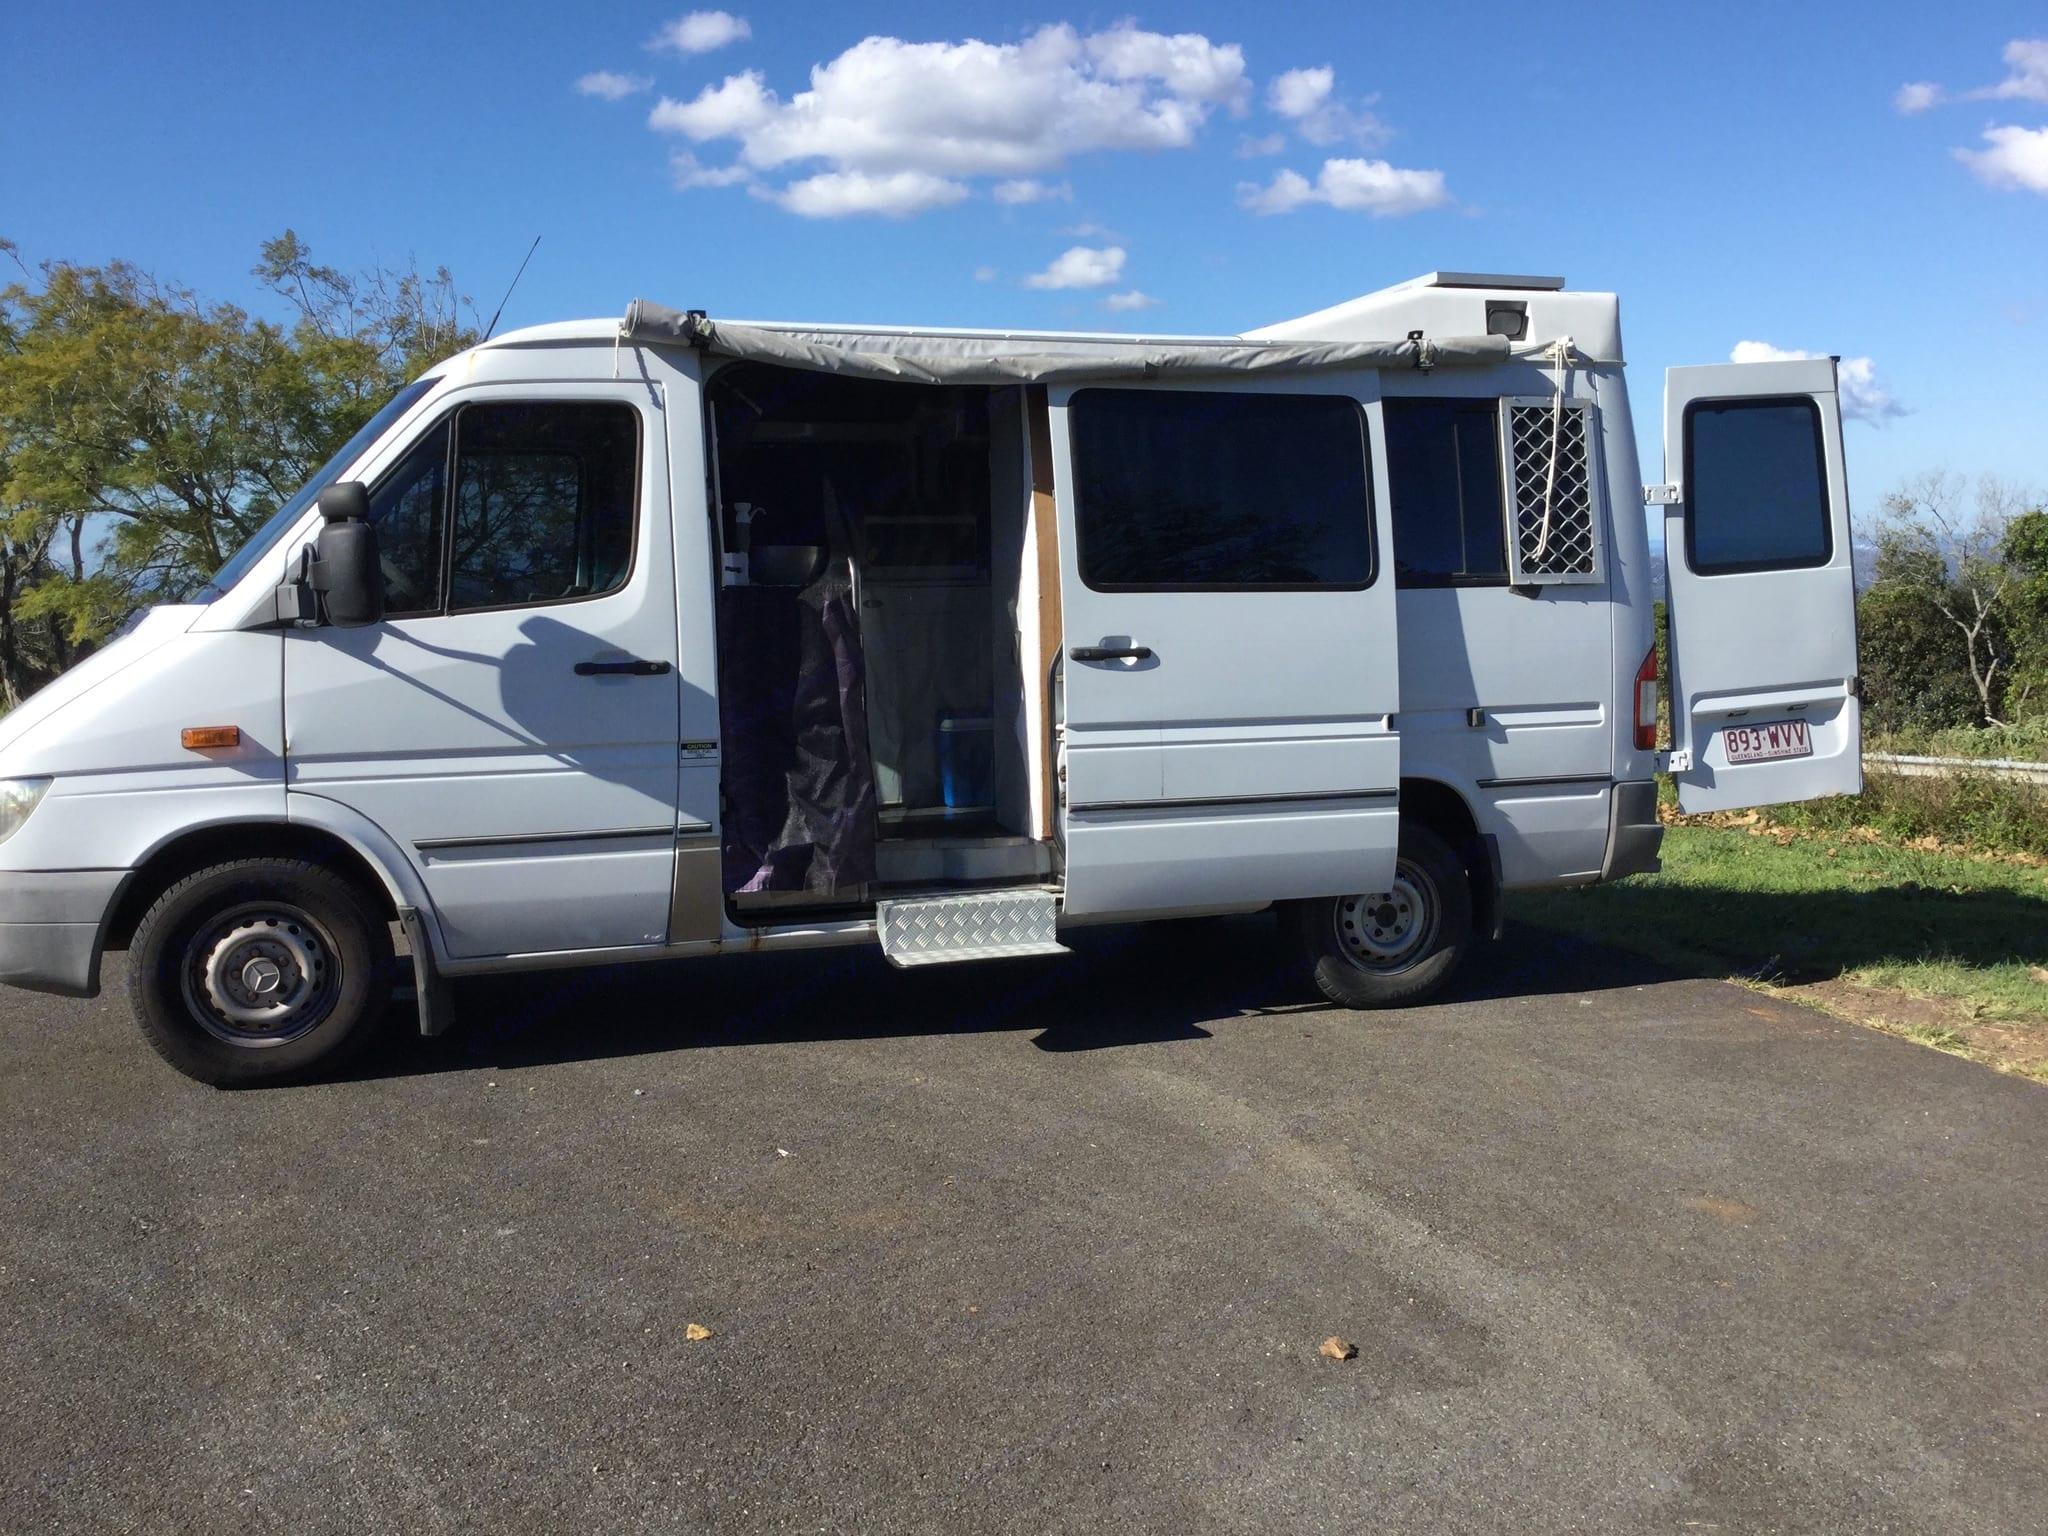 Comfortable van with plenty of storage and extras. Mercedes-Benz Sprinter 2004